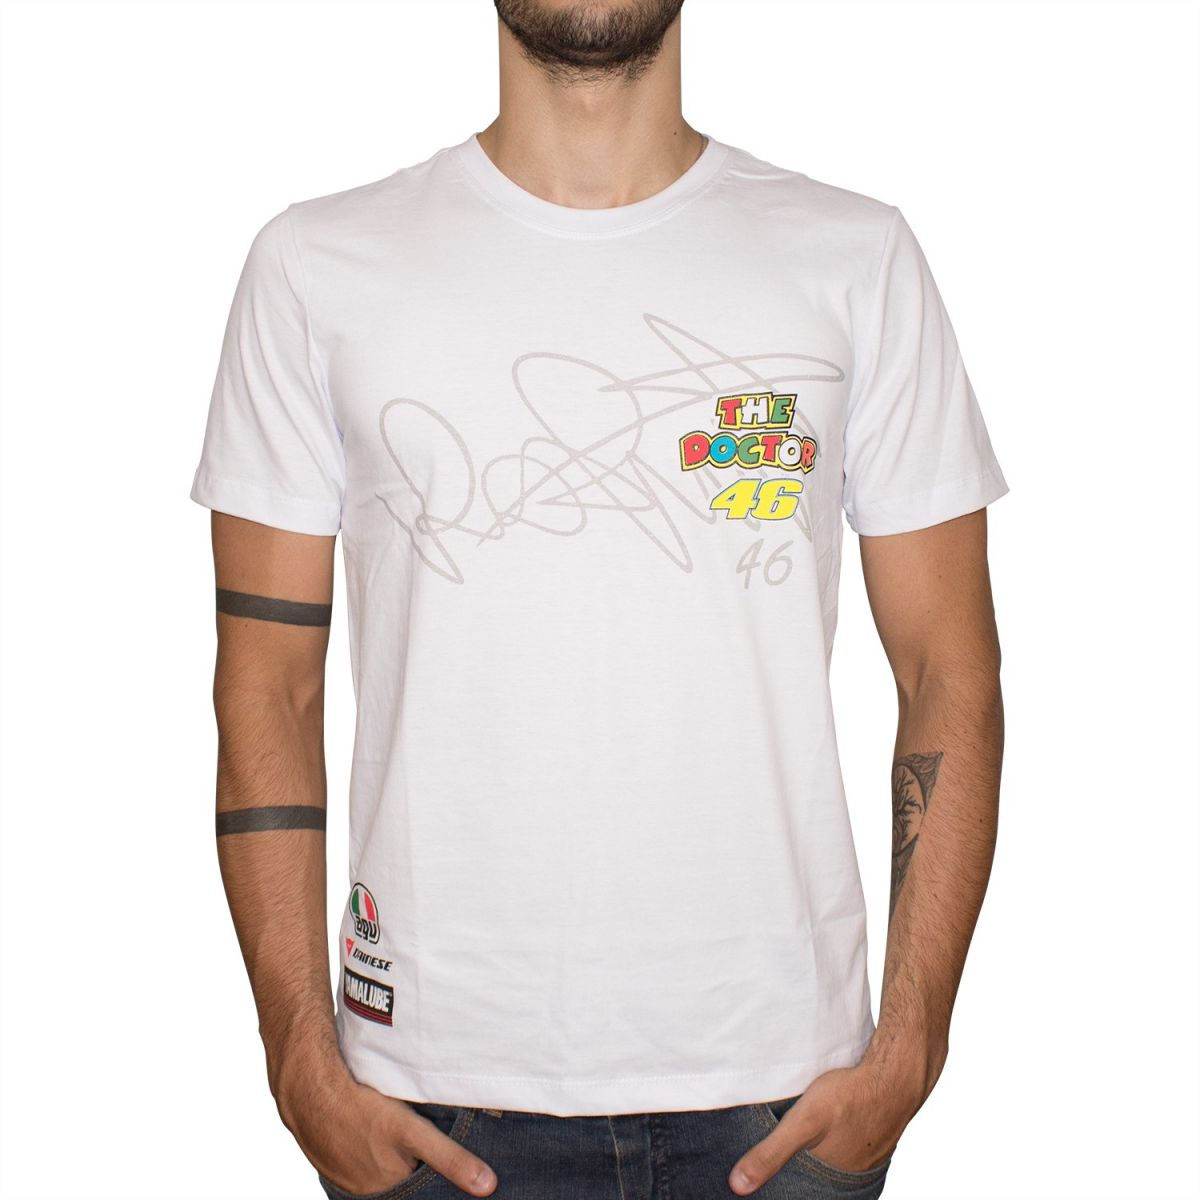 Camiseta Speed Race The Doctor 46 (Branca) Lançamento!!  - Super Bike - Loja Oficial Alpinestars